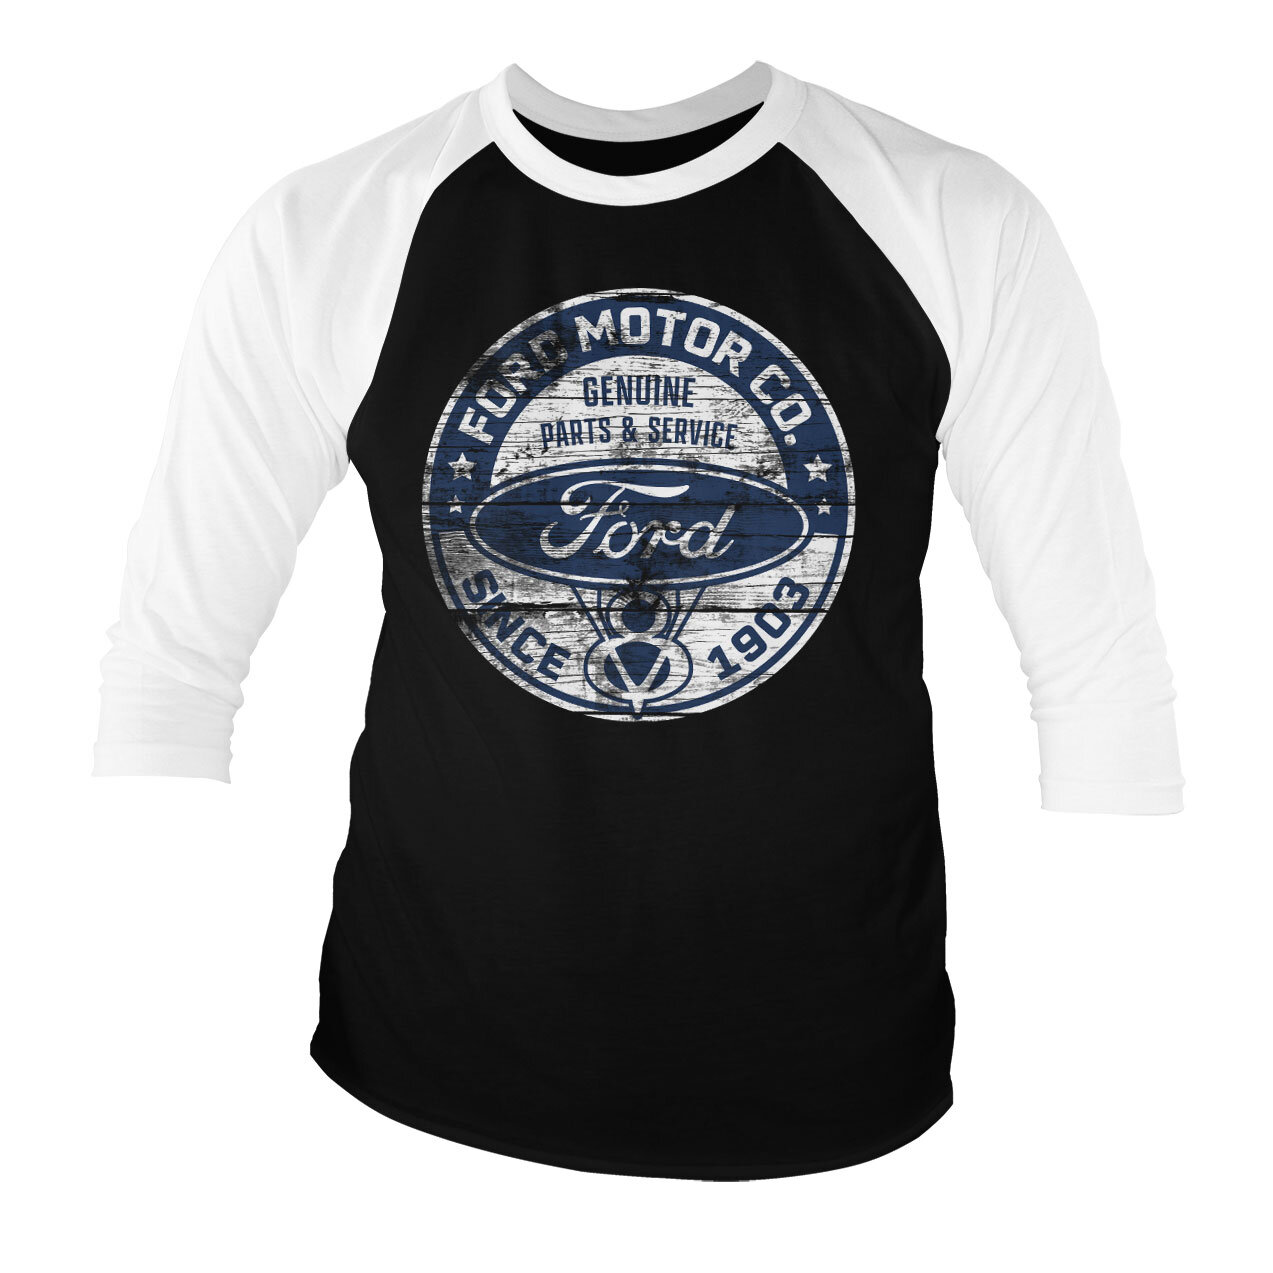 Ford Motor Co. Since 1903 Baseball 3/4 Sleeve Tee